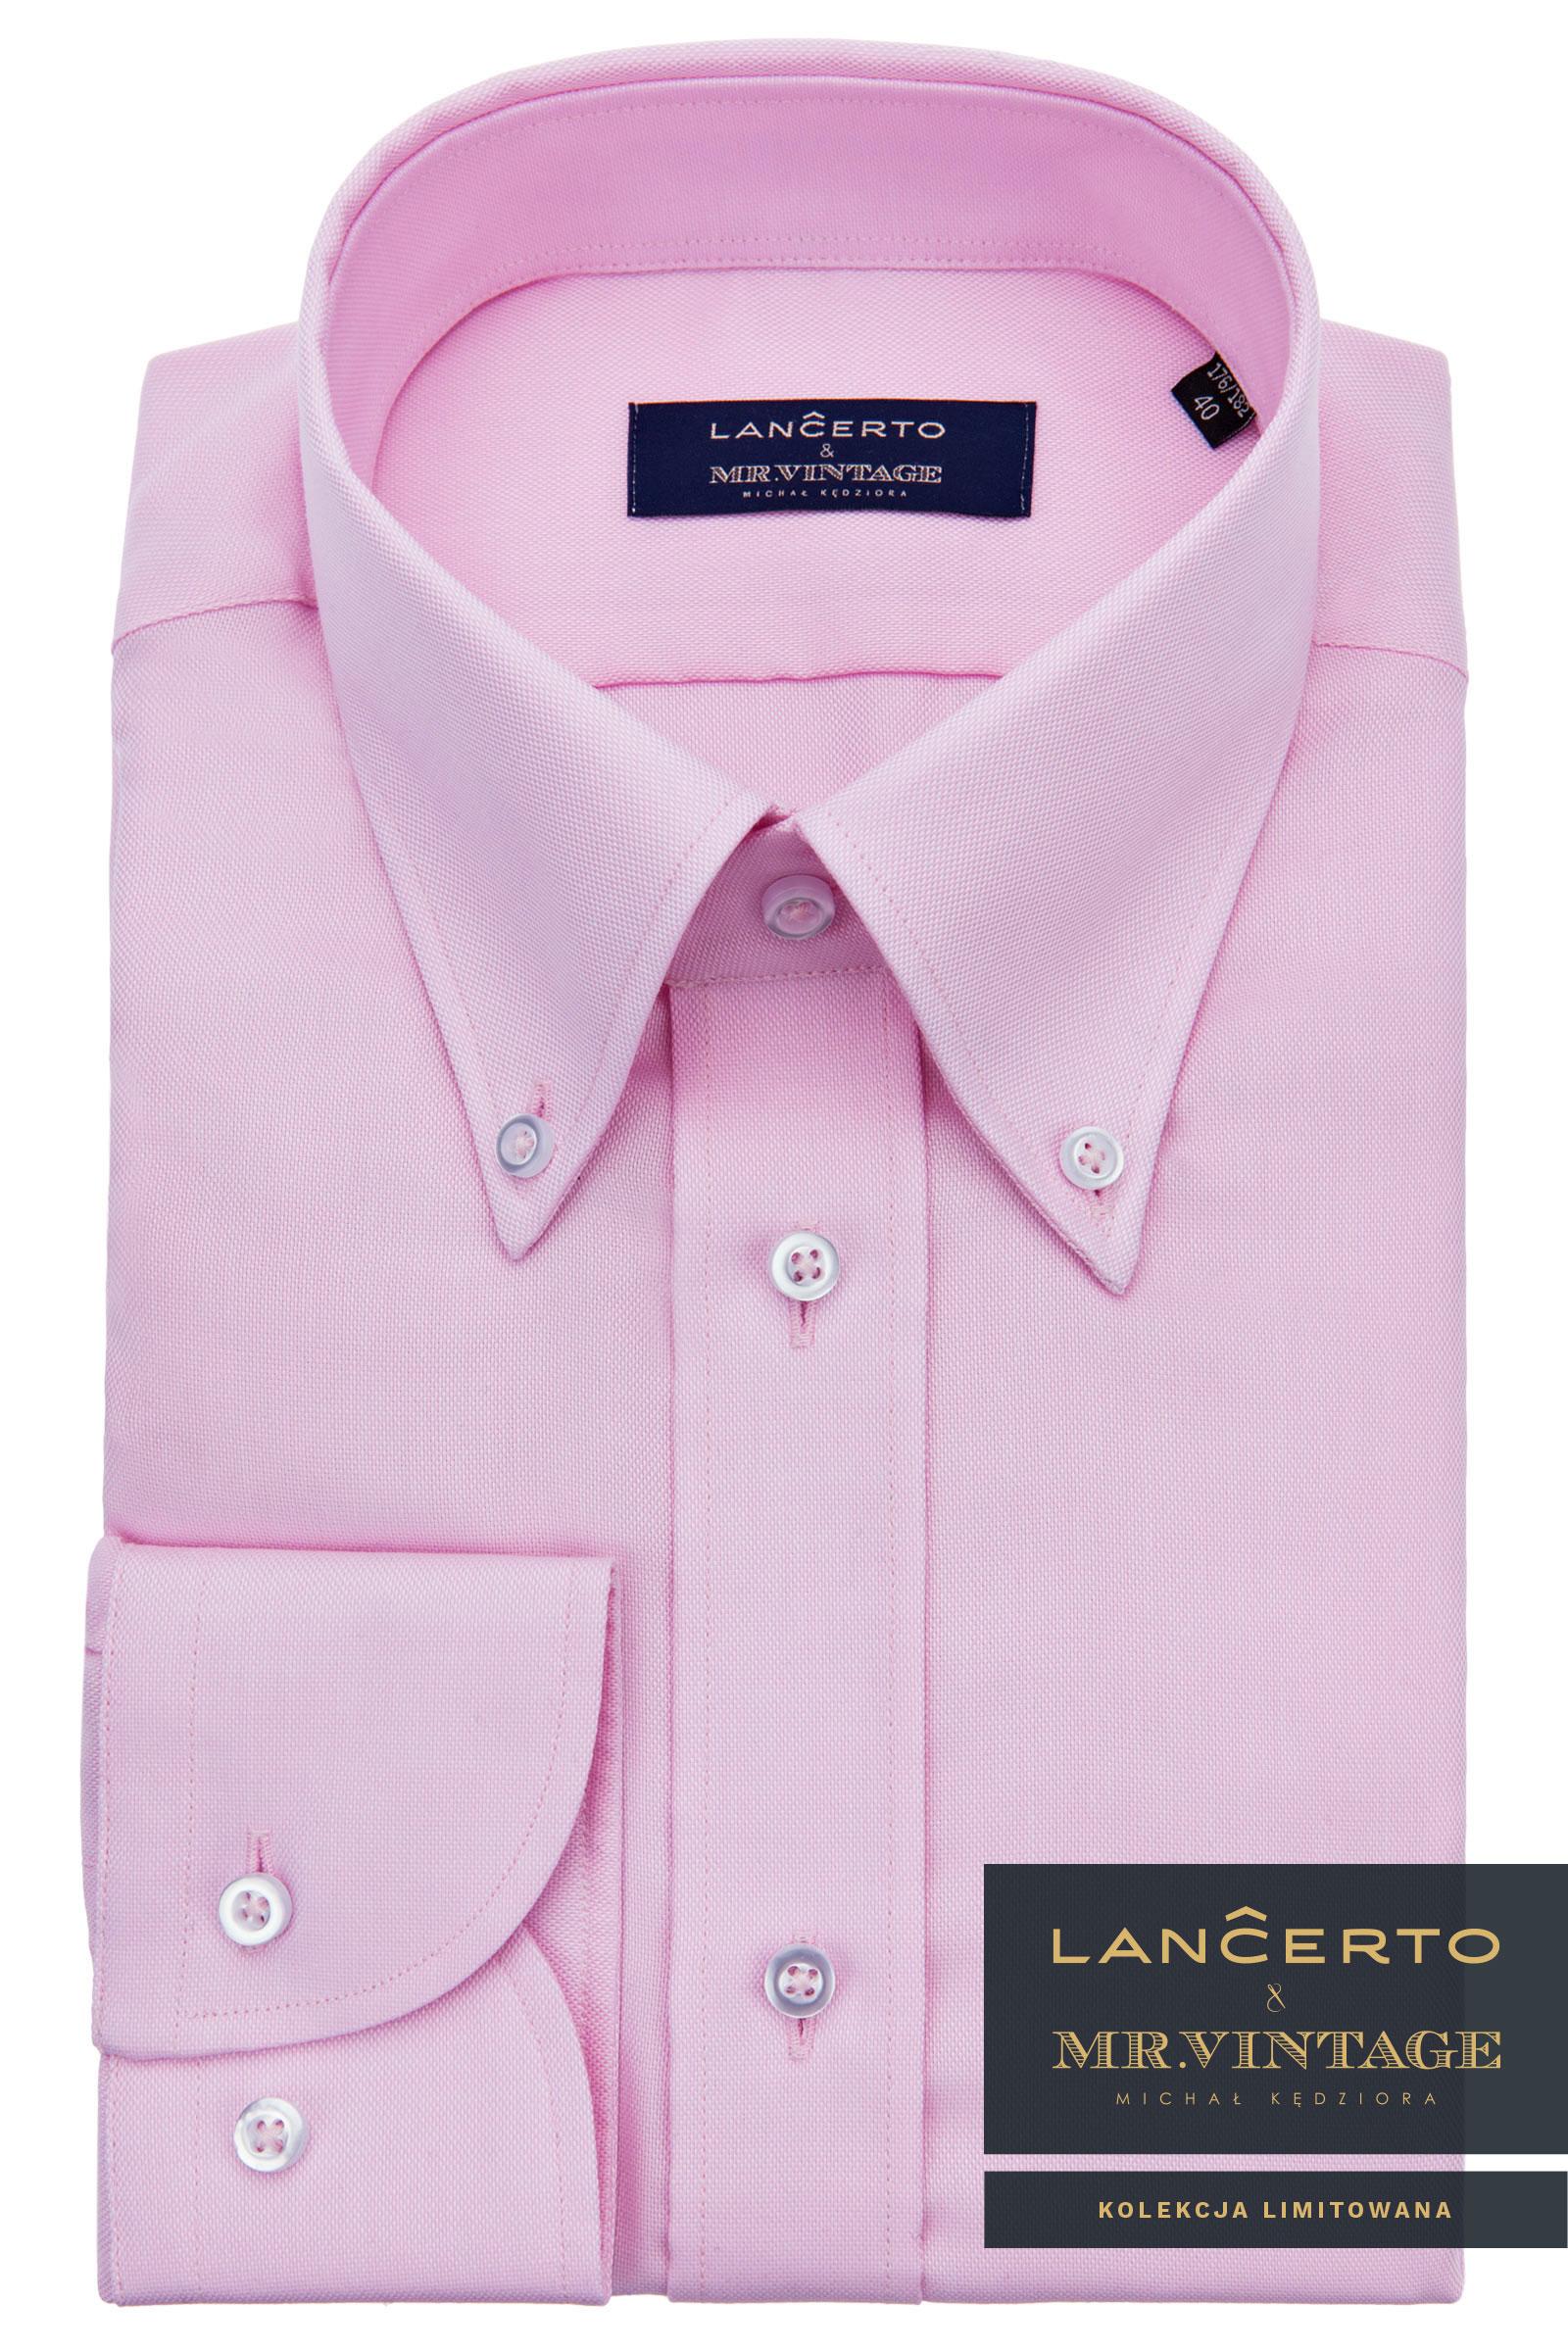 Lancerto tričko&Pán Vintage Most 176/40